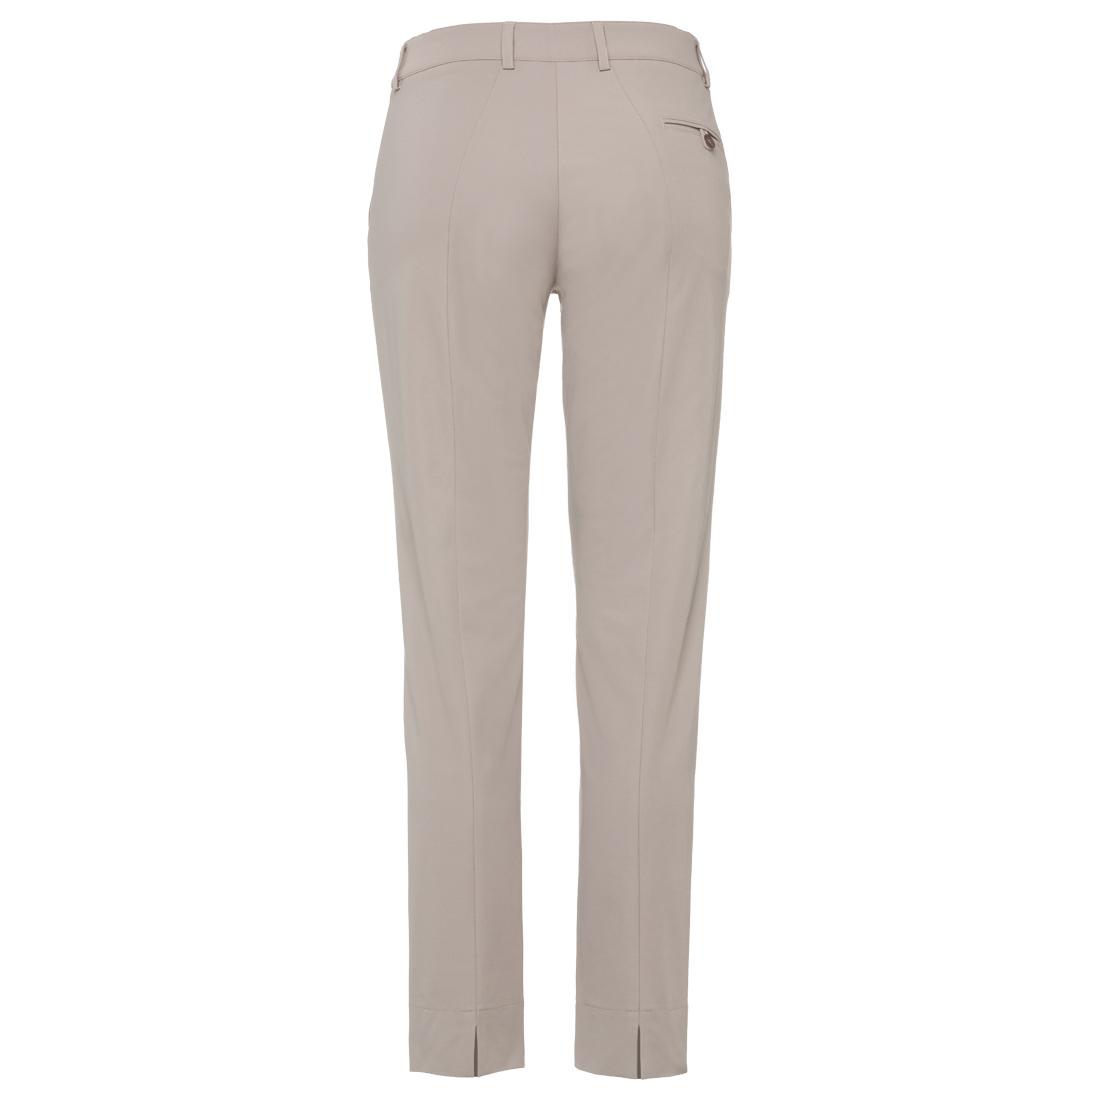 Damen Funktions-Golfhose Techno Stretch Slim Fit